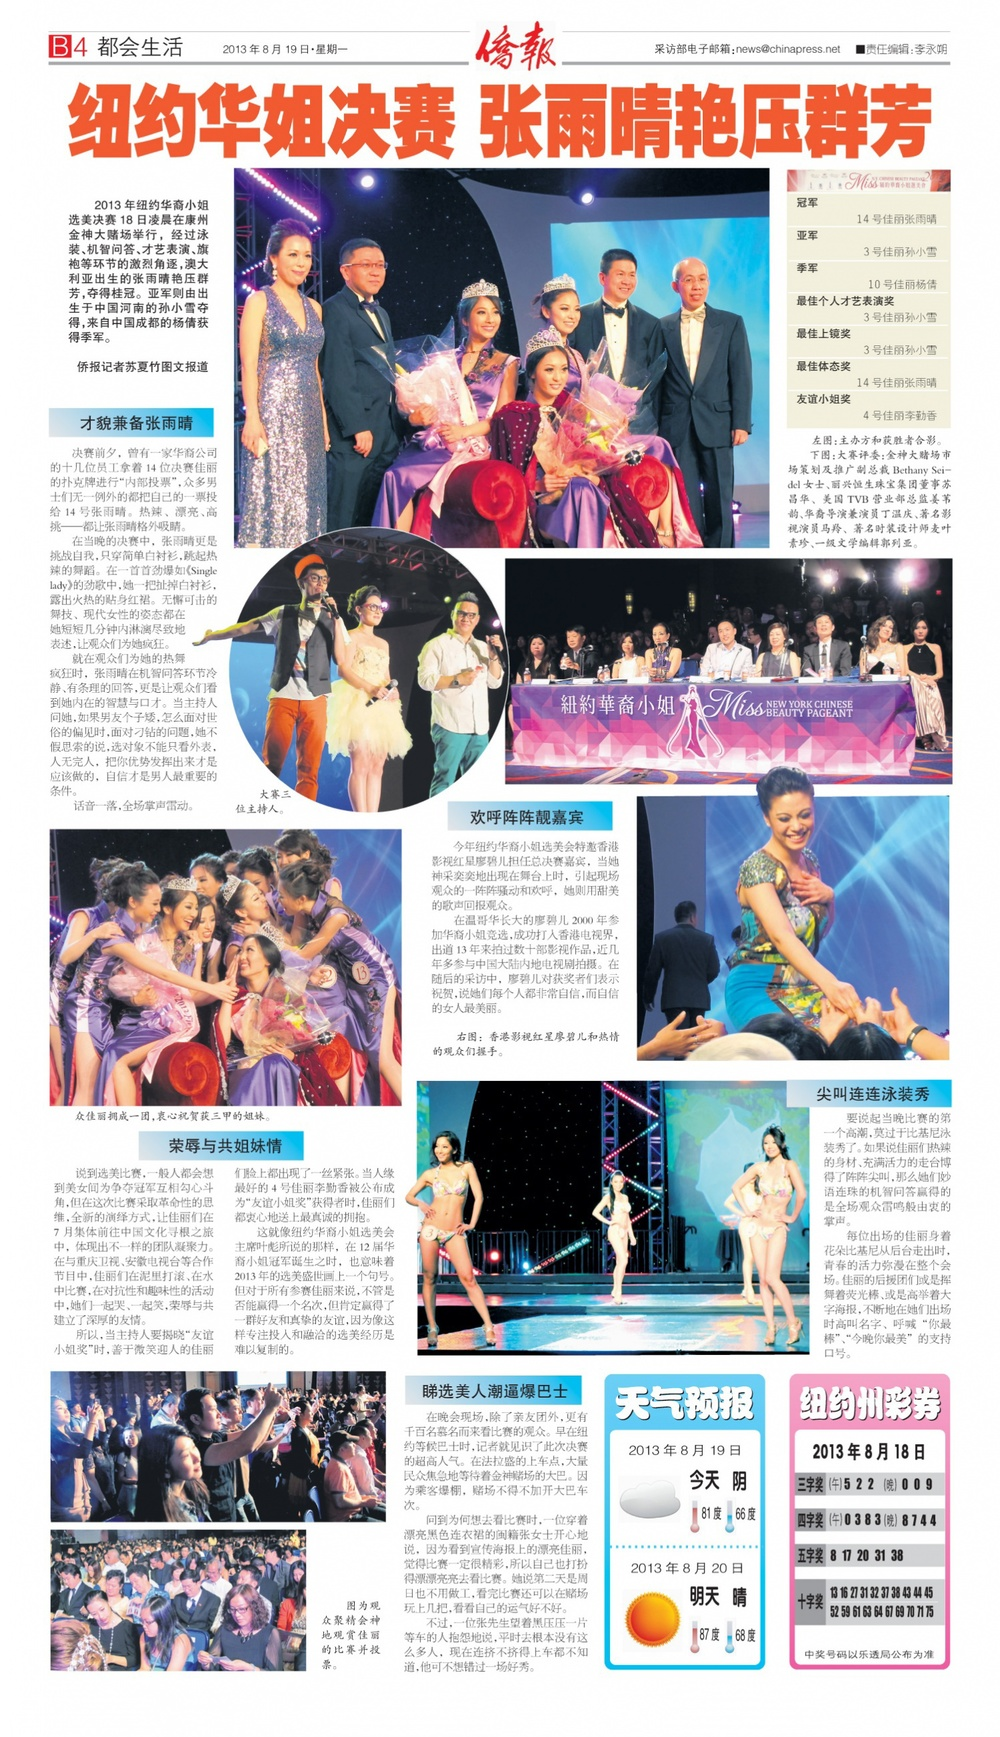 2013-08-18_Final_China Press.jpg